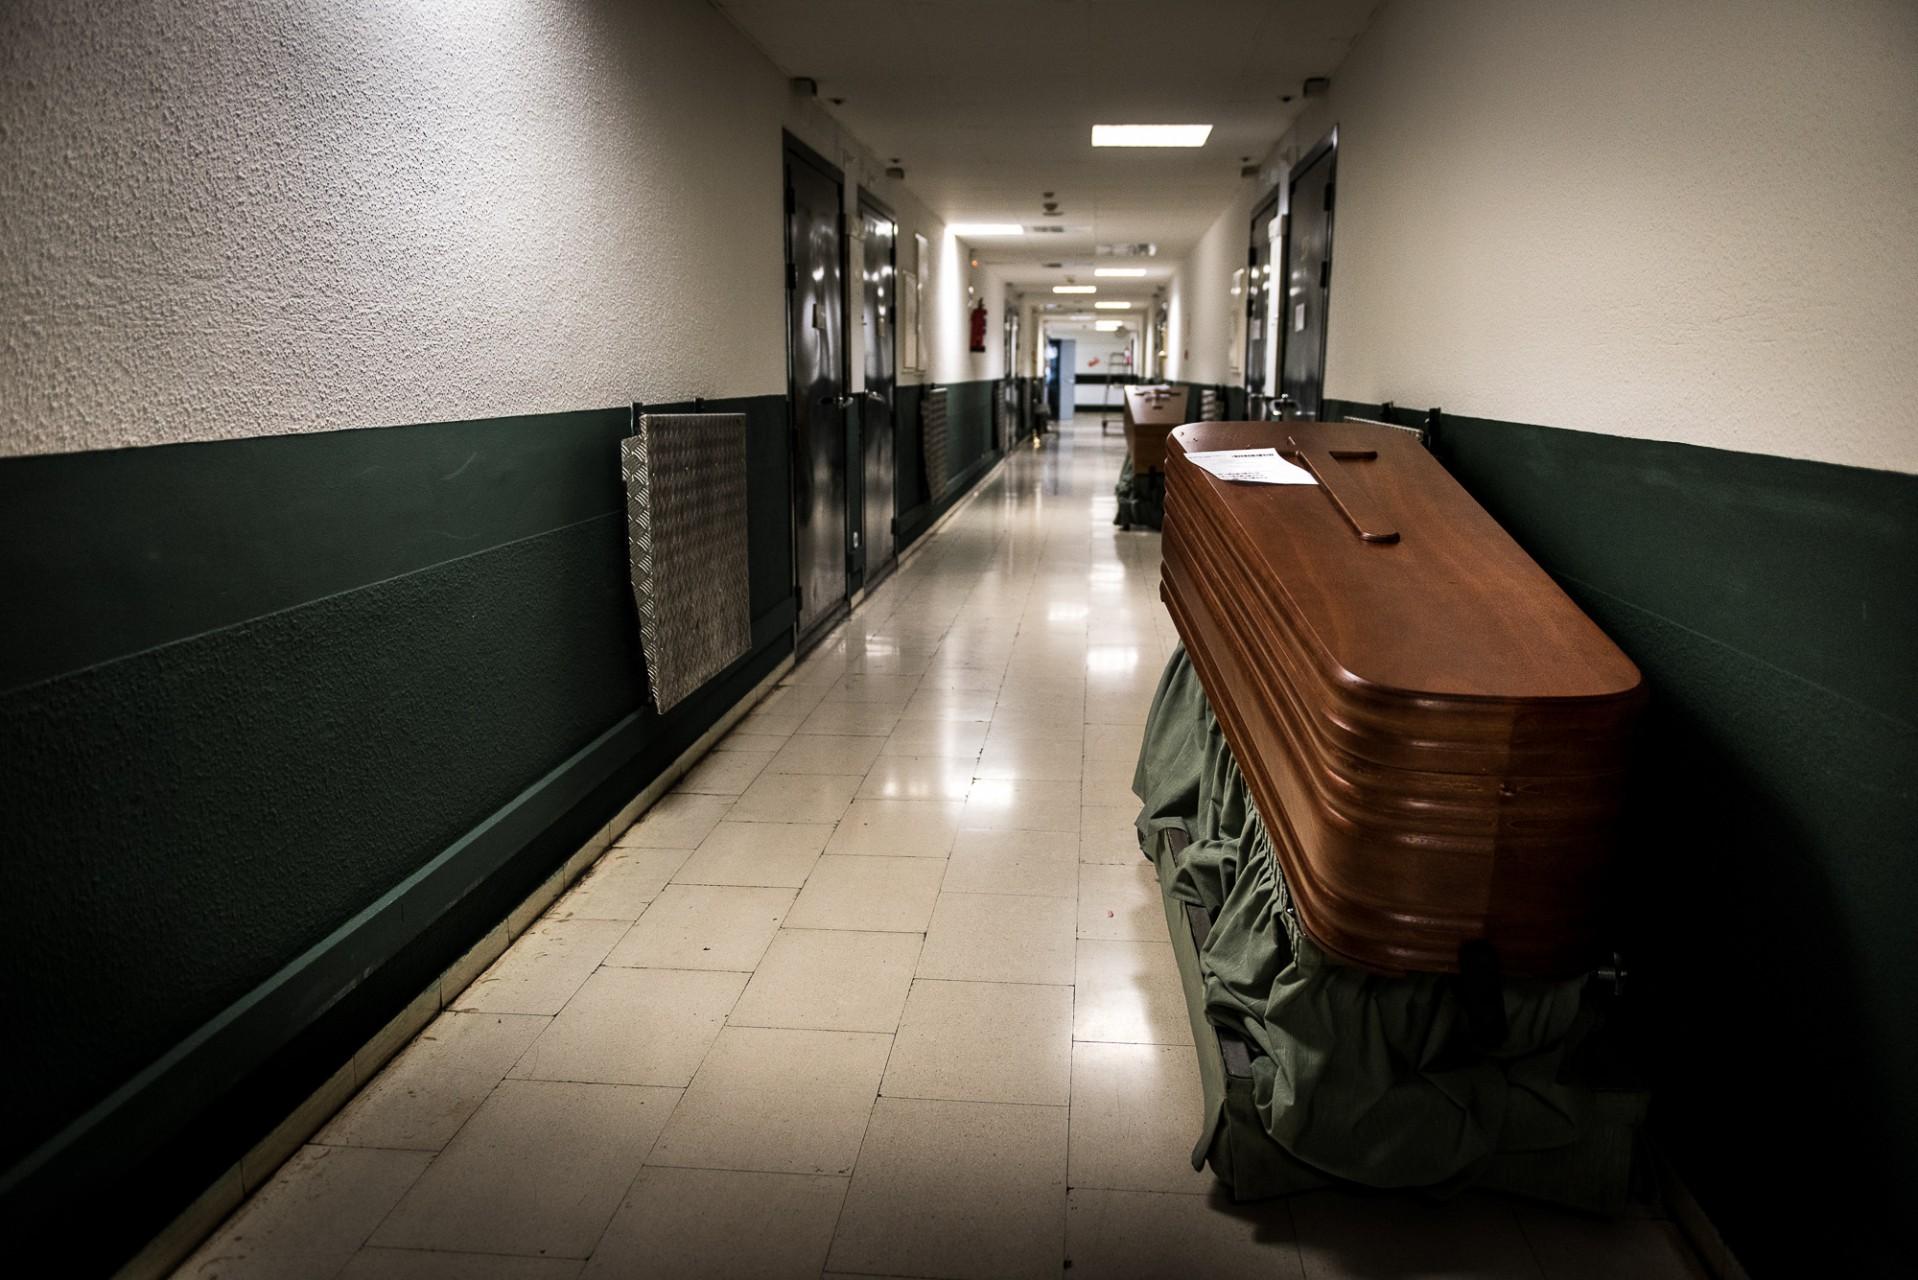 Ana Matos - sector funerario 2015-14